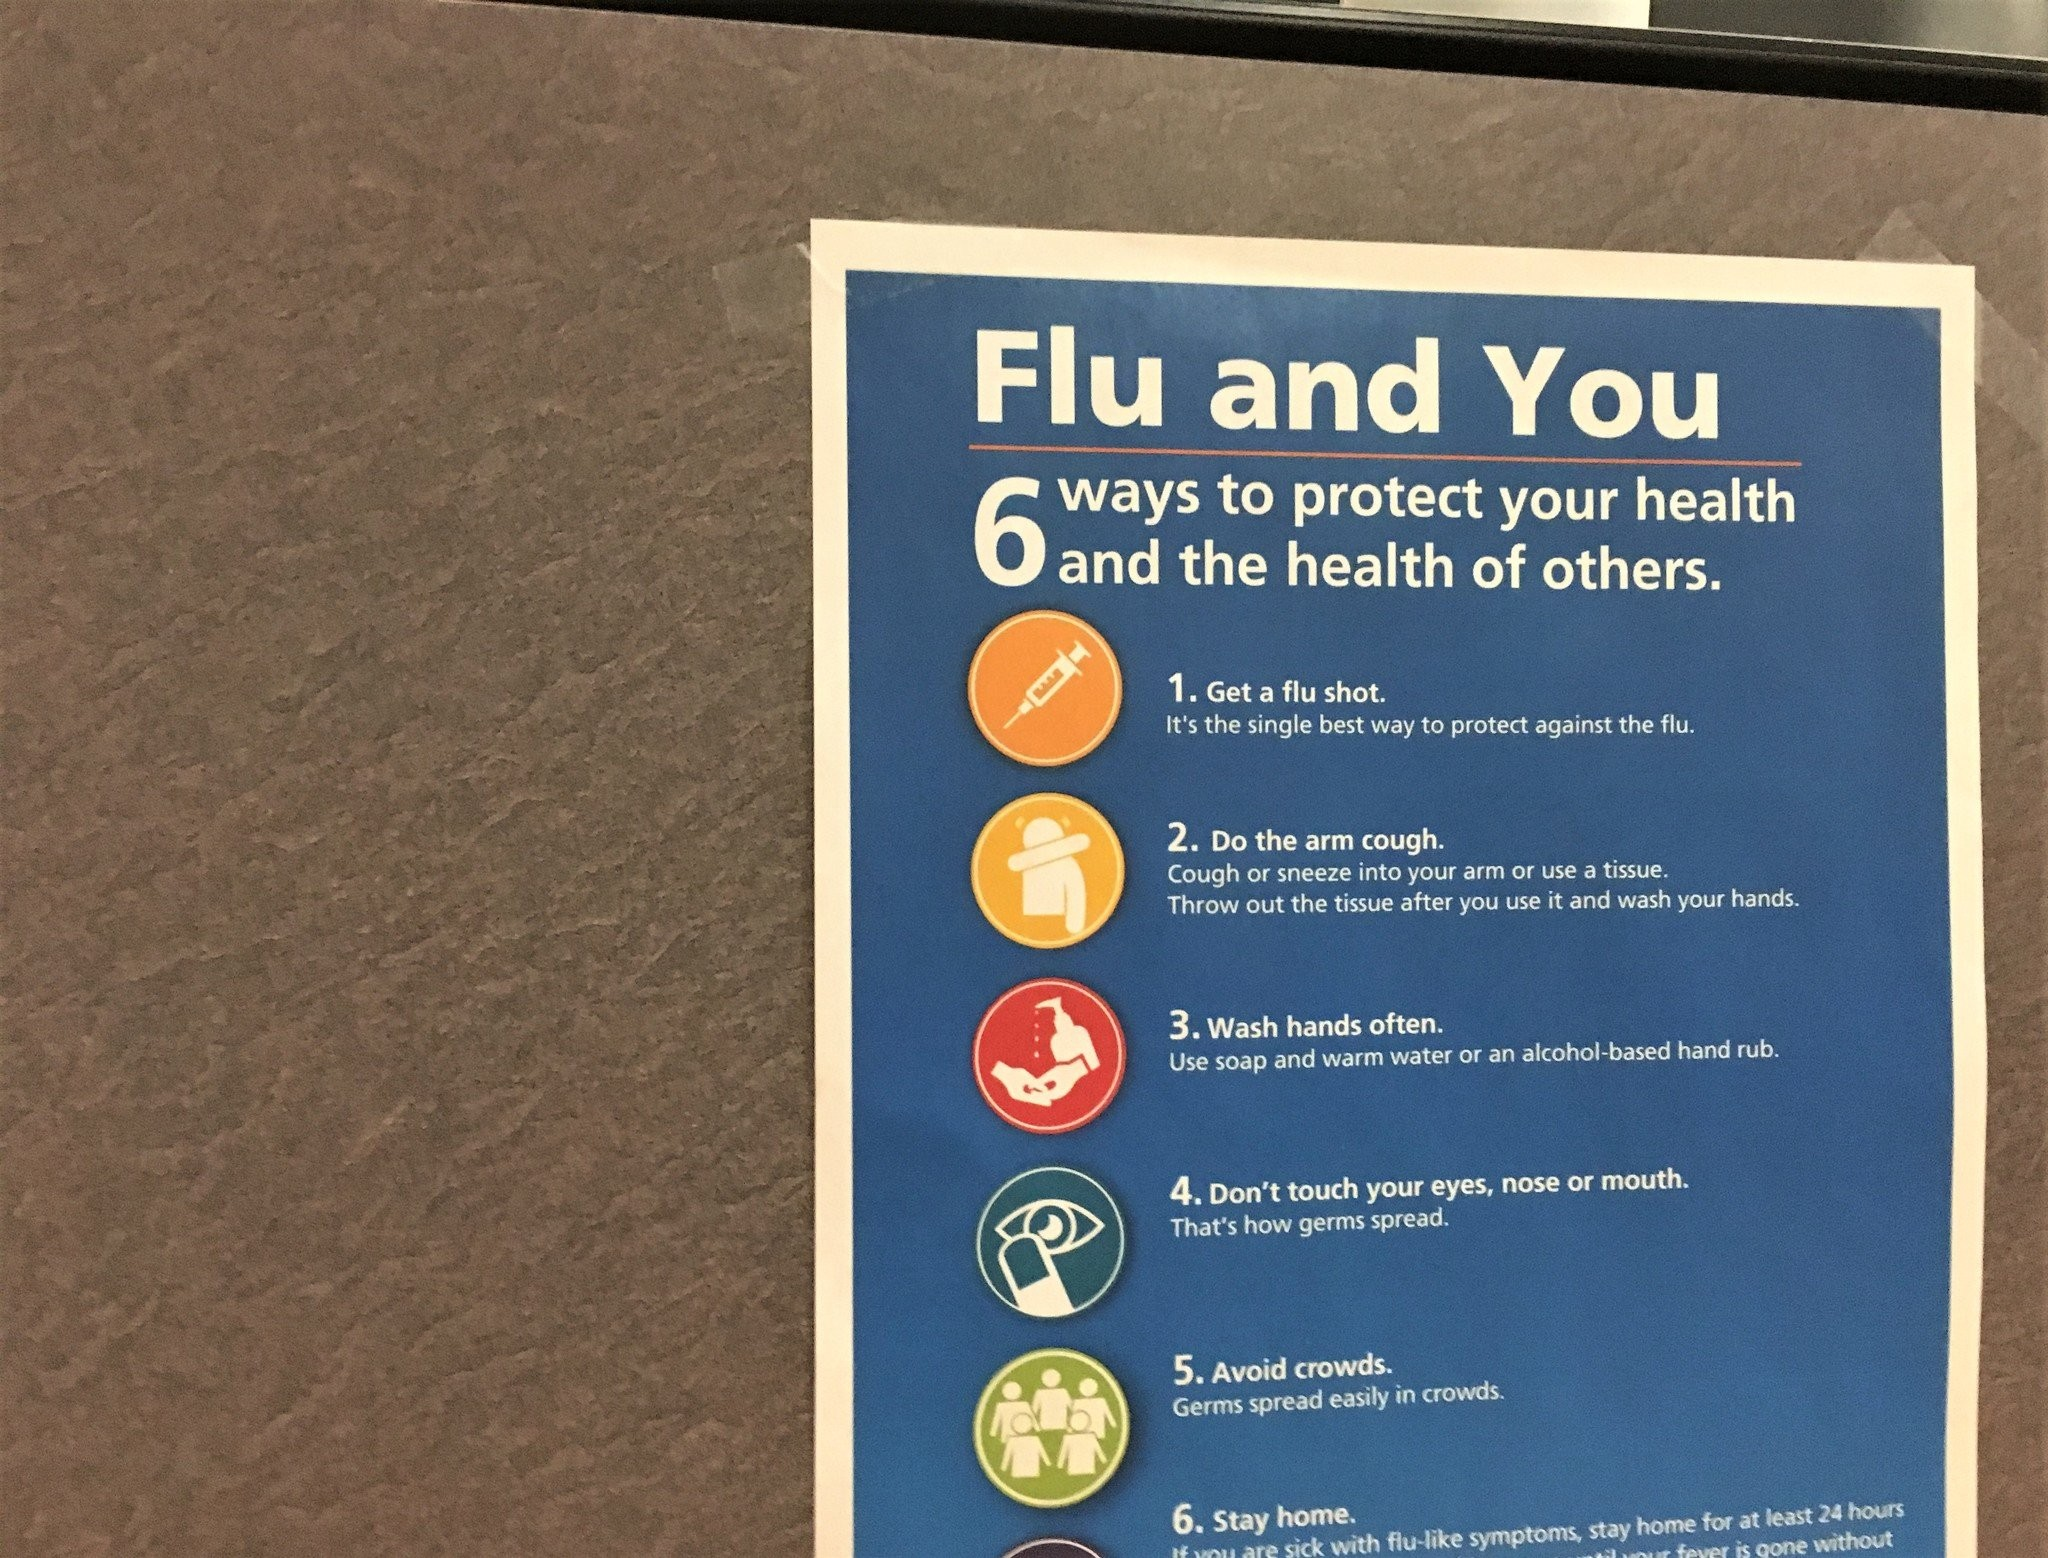 CDC: Pediatric flu deaths now at 13, flu widespread in 24 states ...